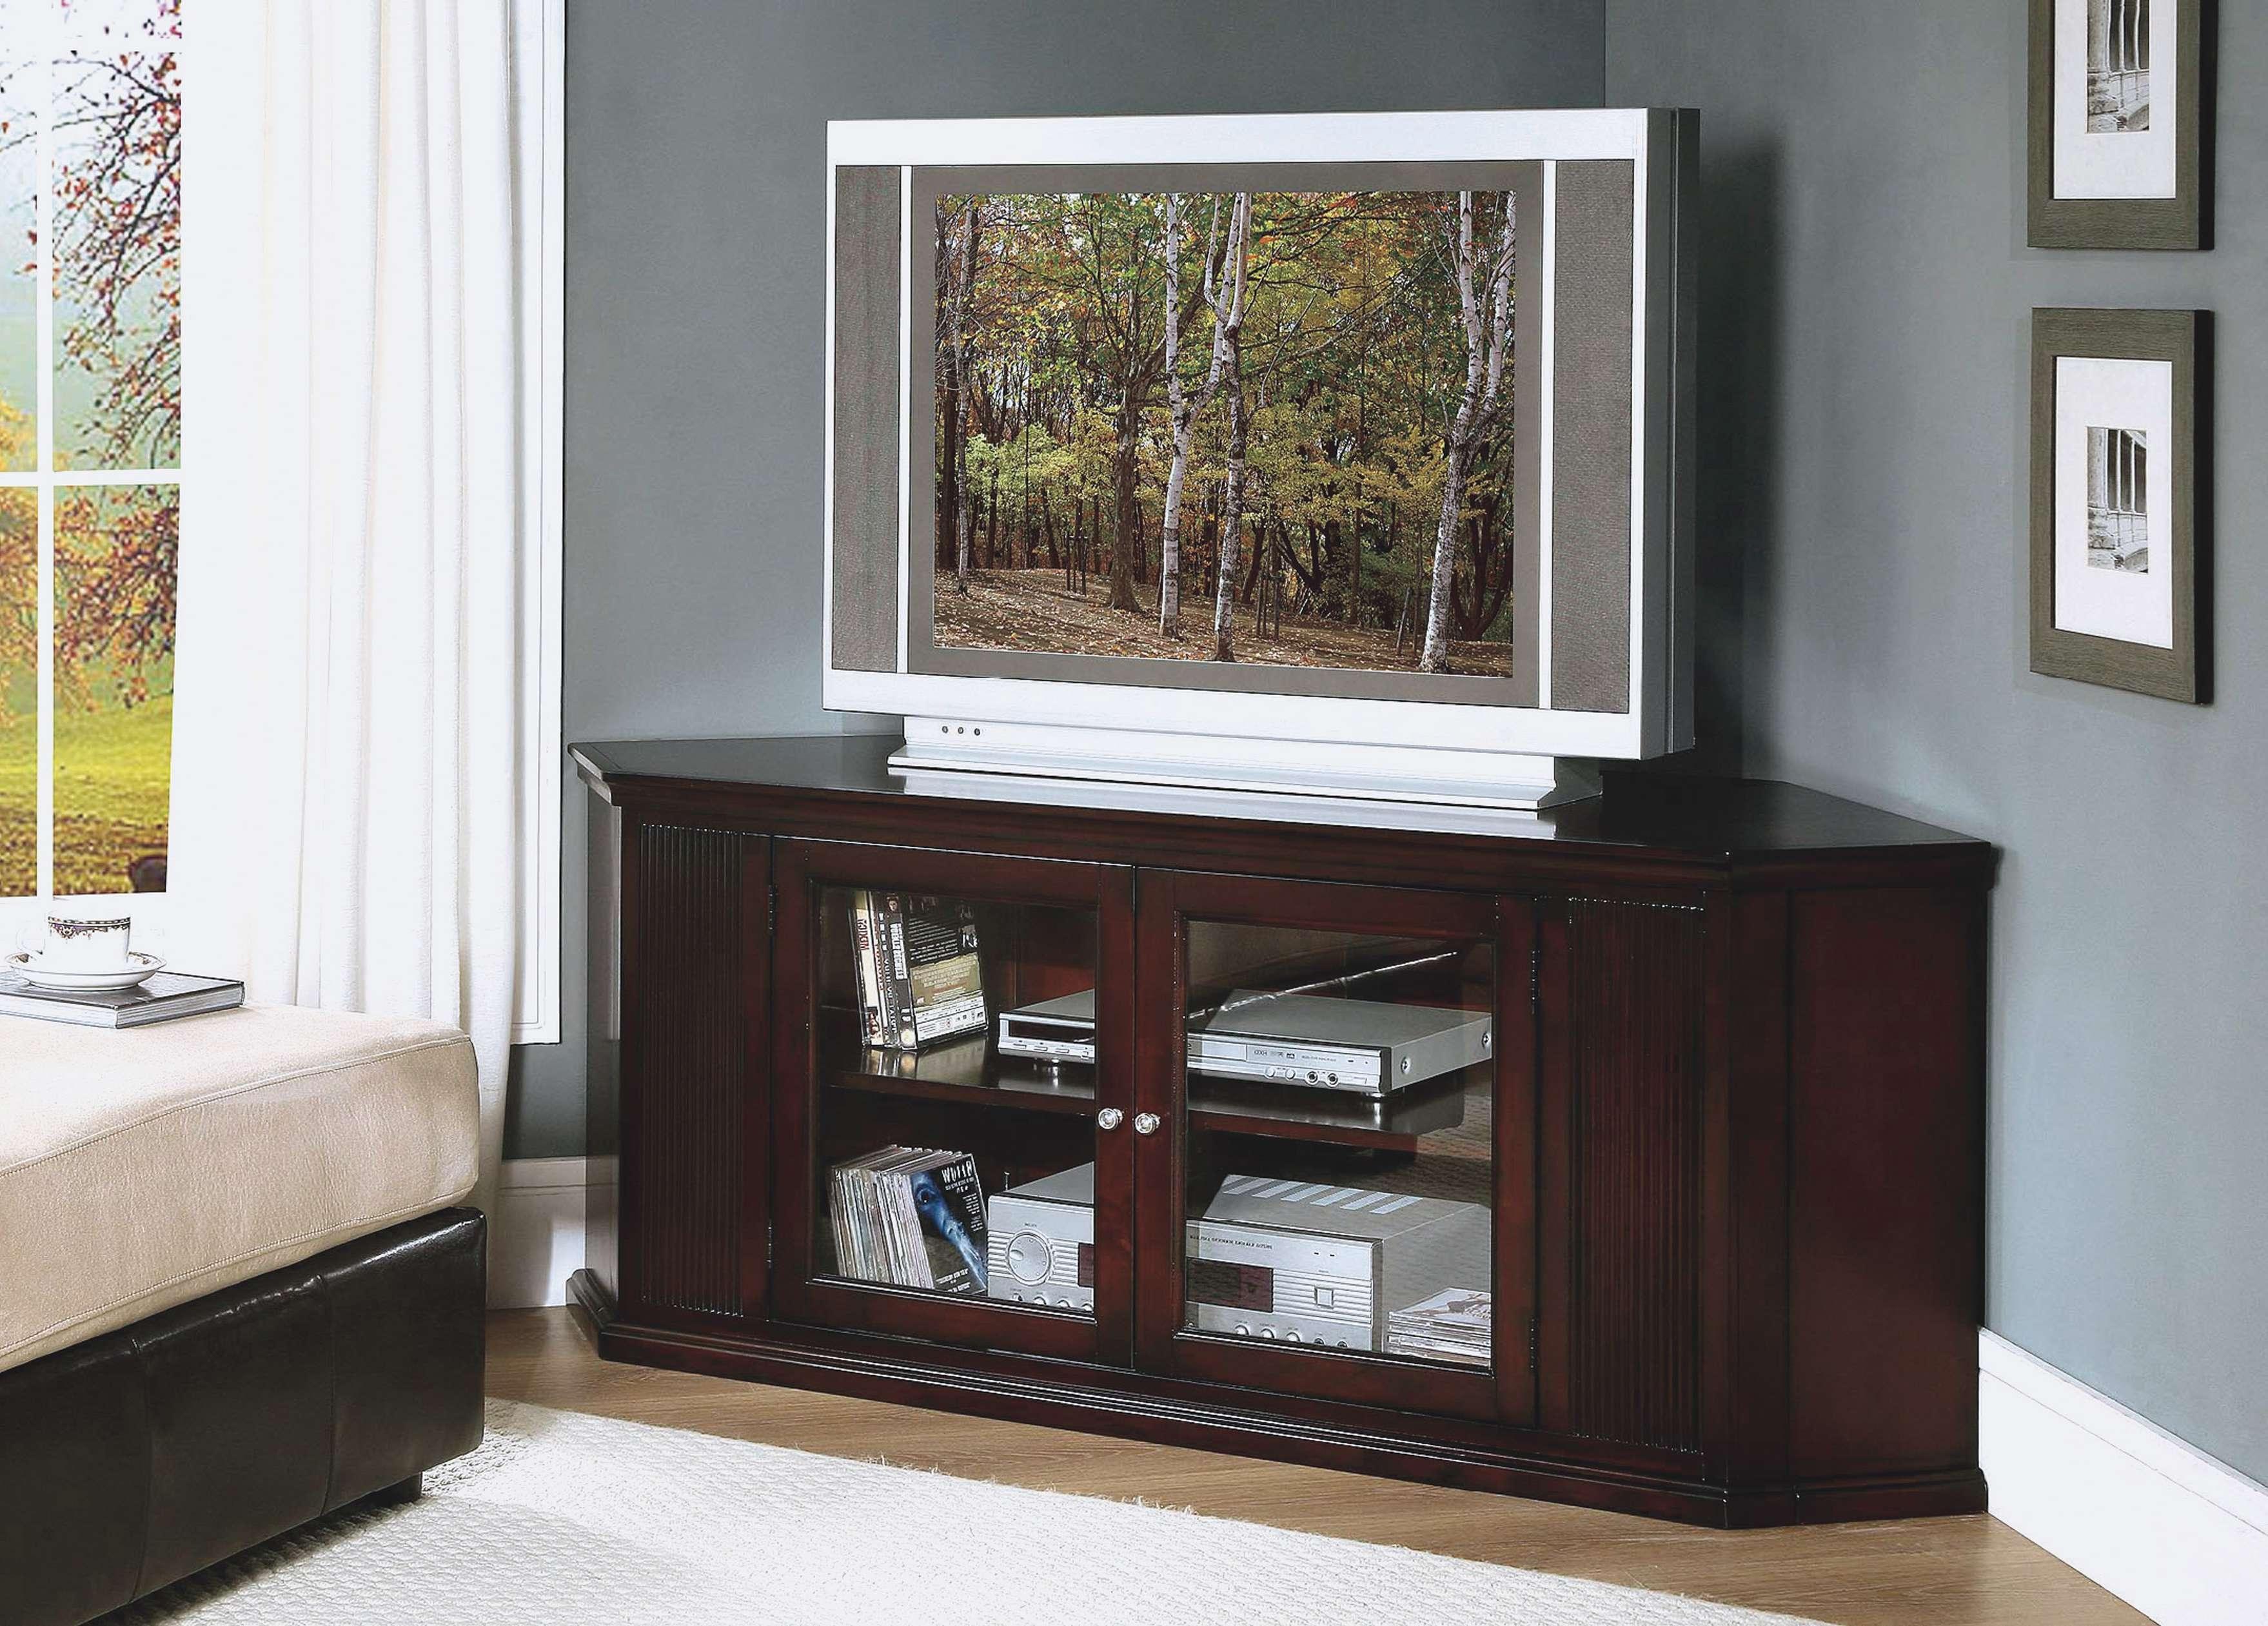 Dark Brown Oak Wood Corner Tv Stand With Glass Doors Of Dazzling Throughout Dark Brown Corner Tv Stands (View 10 of 20)